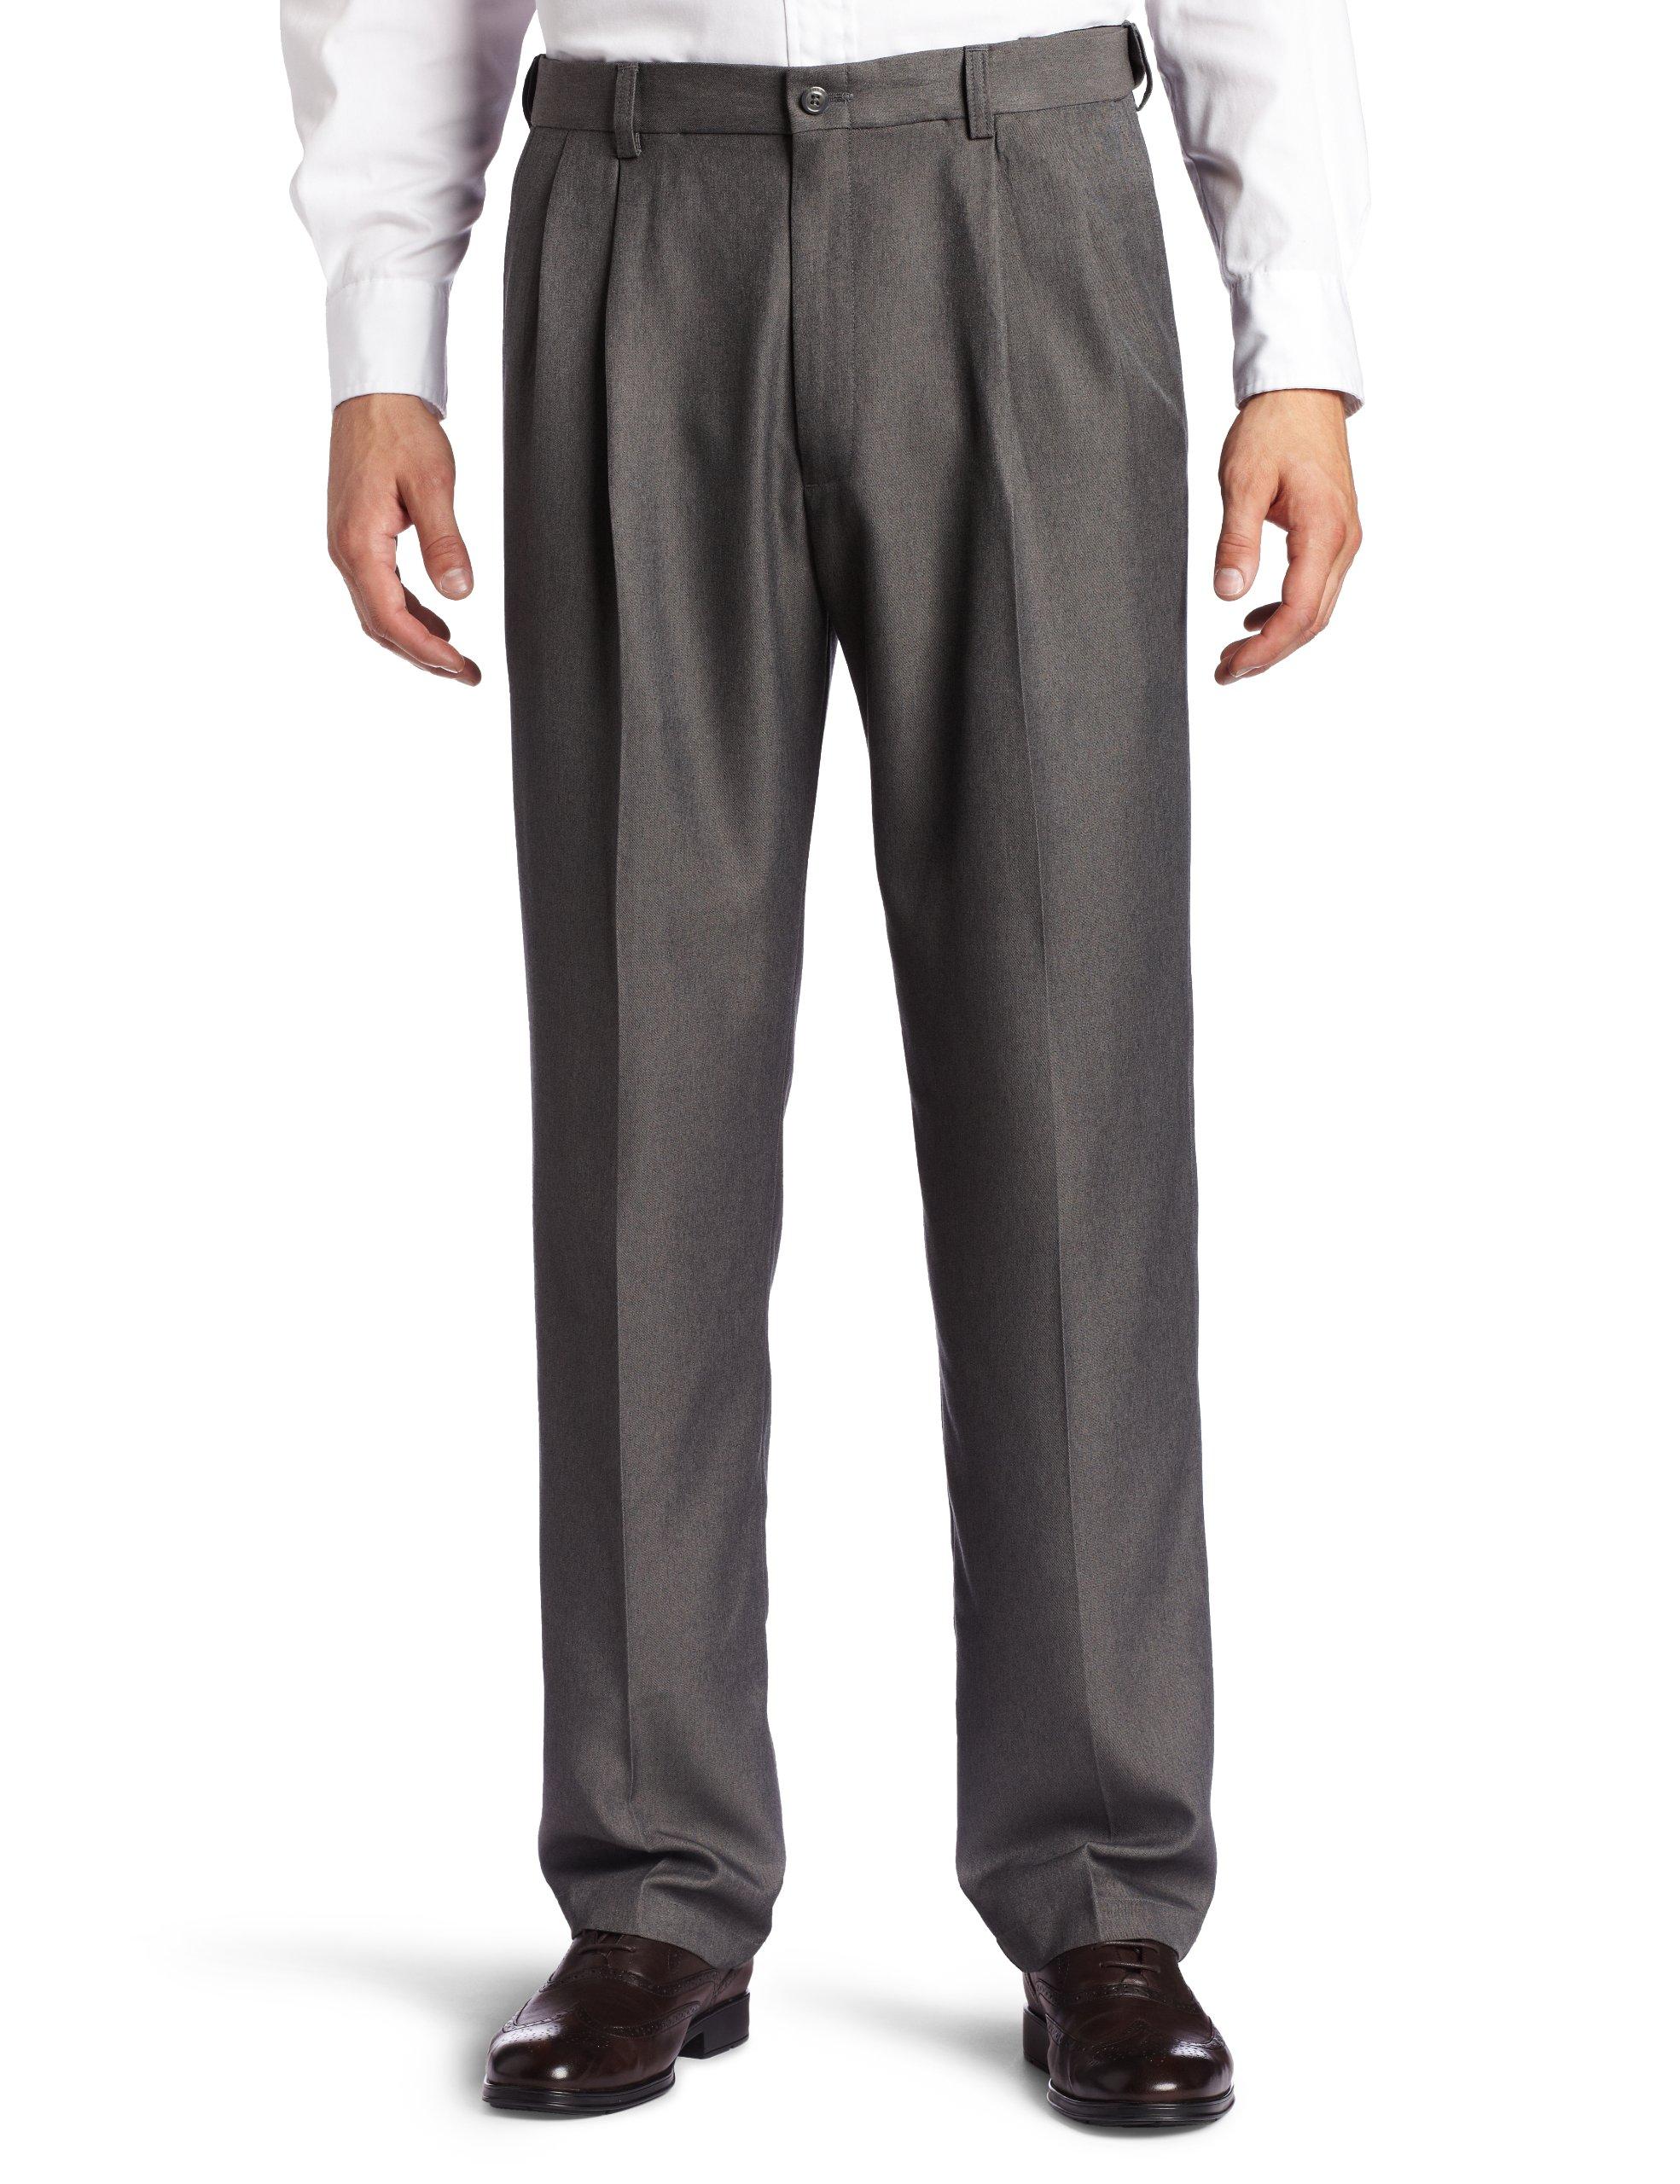 5d01644be892b Best Rated in Men s Dress Pants   Helpful Customer Reviews - Amazon.com